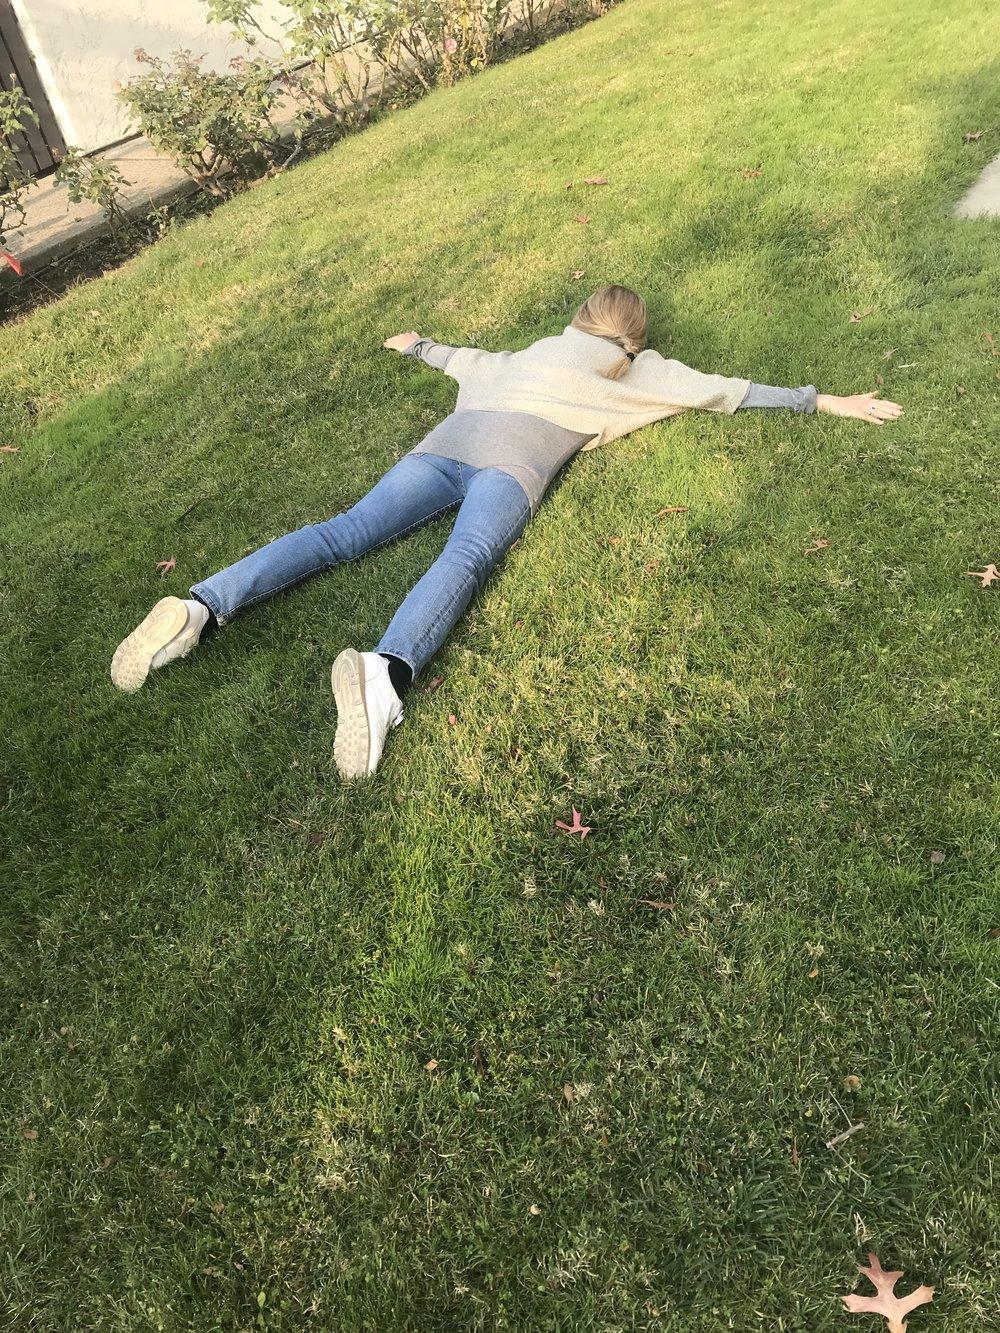 Body Pressure(After Bruce Nauman) 2018 - Nazlı Gürlek